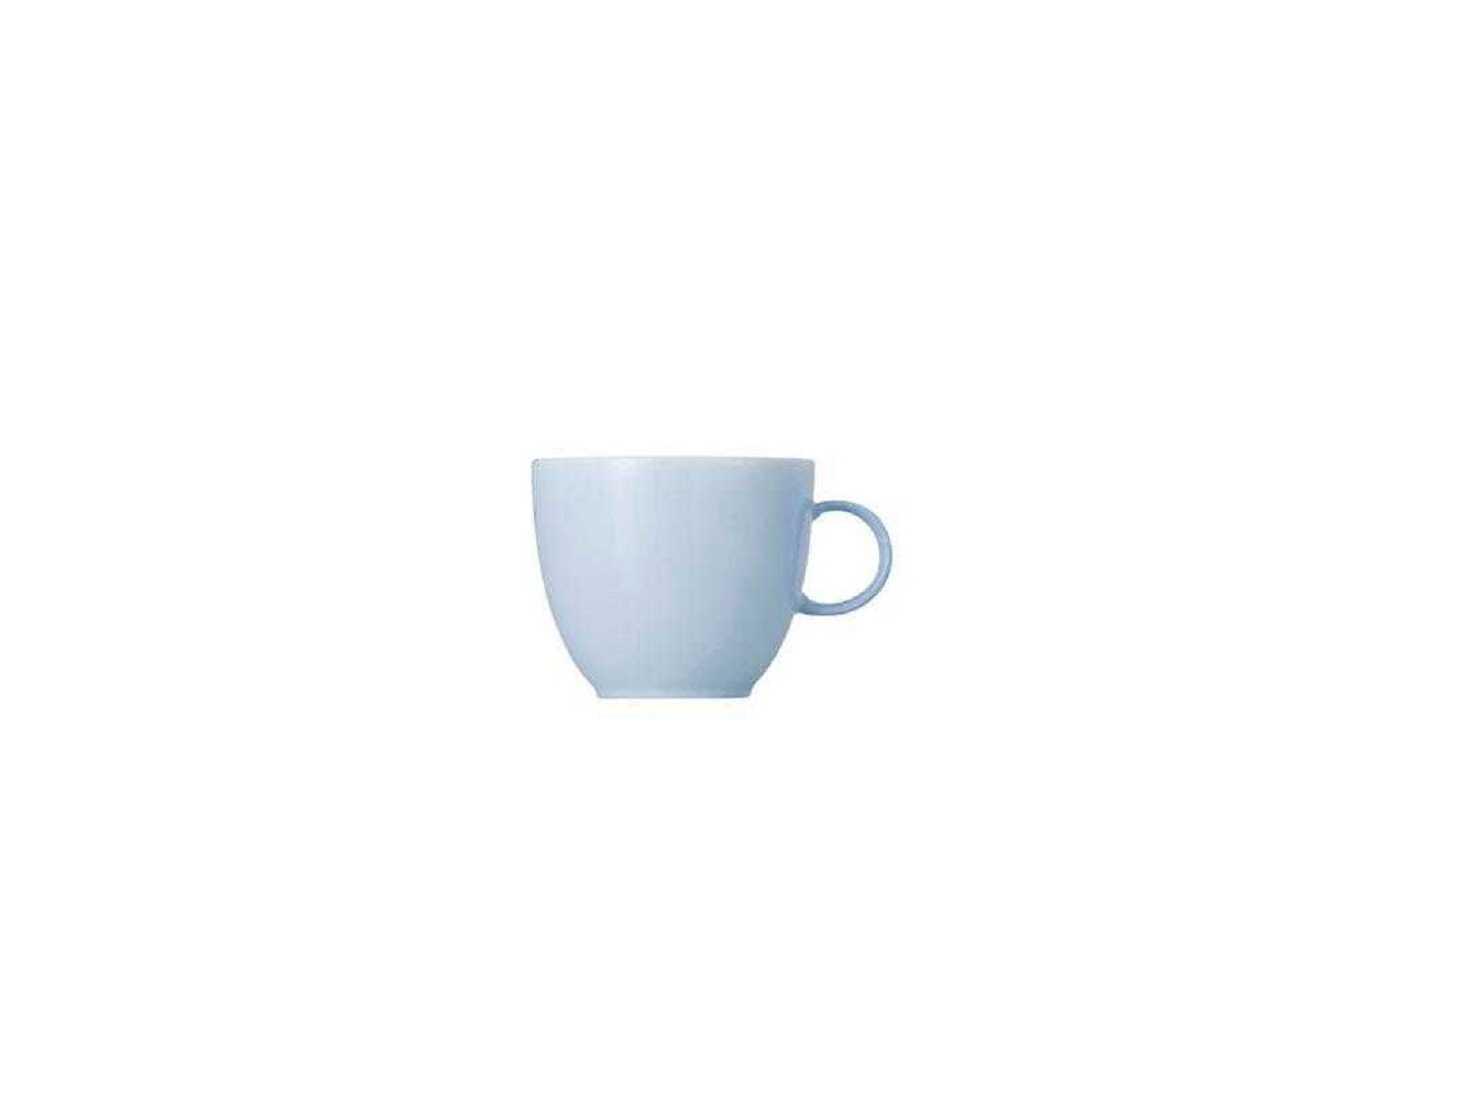 Онлайн каталог PROMENU: Чашка фарфоровая Rosenthal Thomas SUNNY DAY, объем 0,2 л, голубой Rosenthal 70850-408510-14642